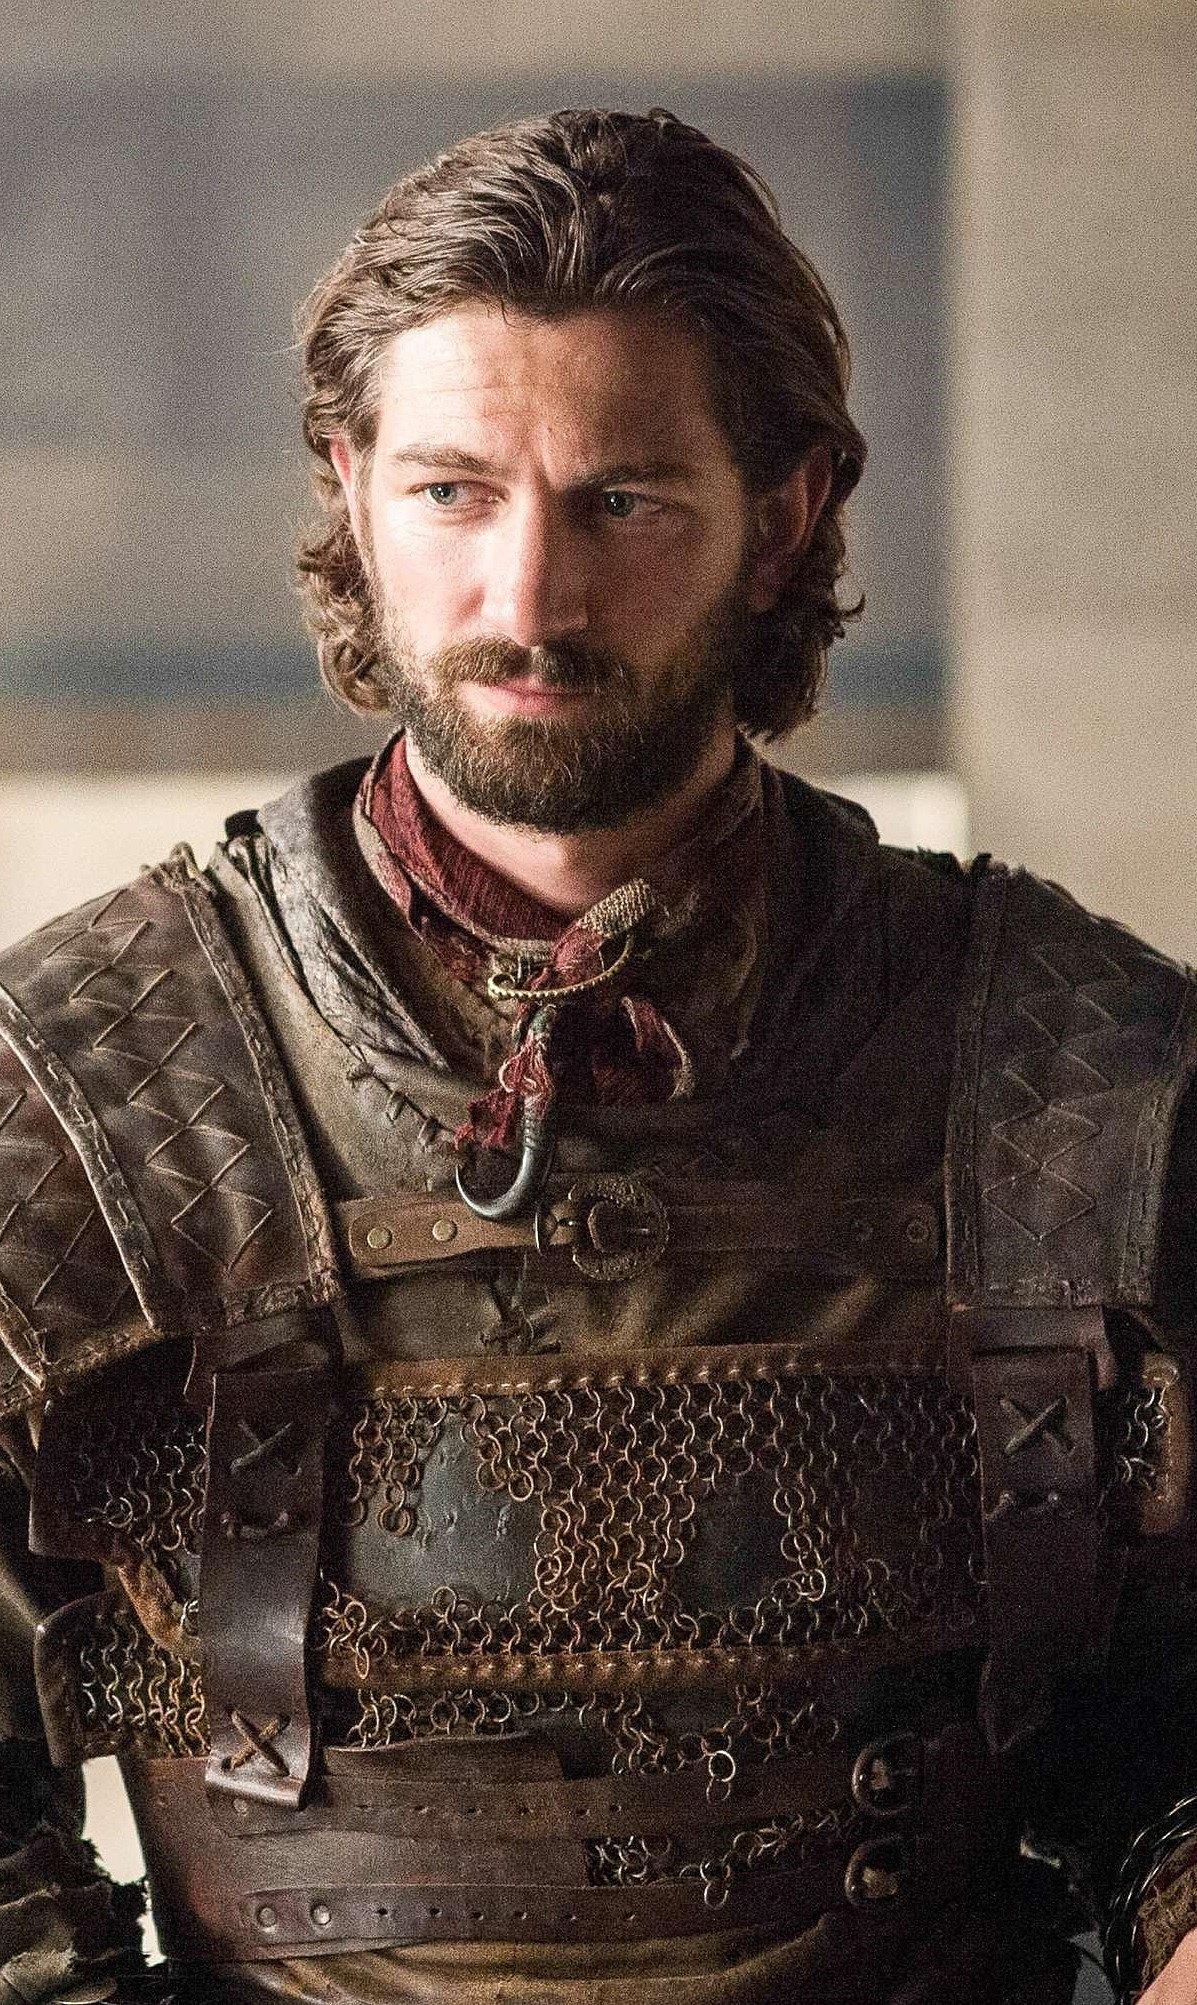 Daario Naharis From Game of Thrones | 450 Pop Culture ...